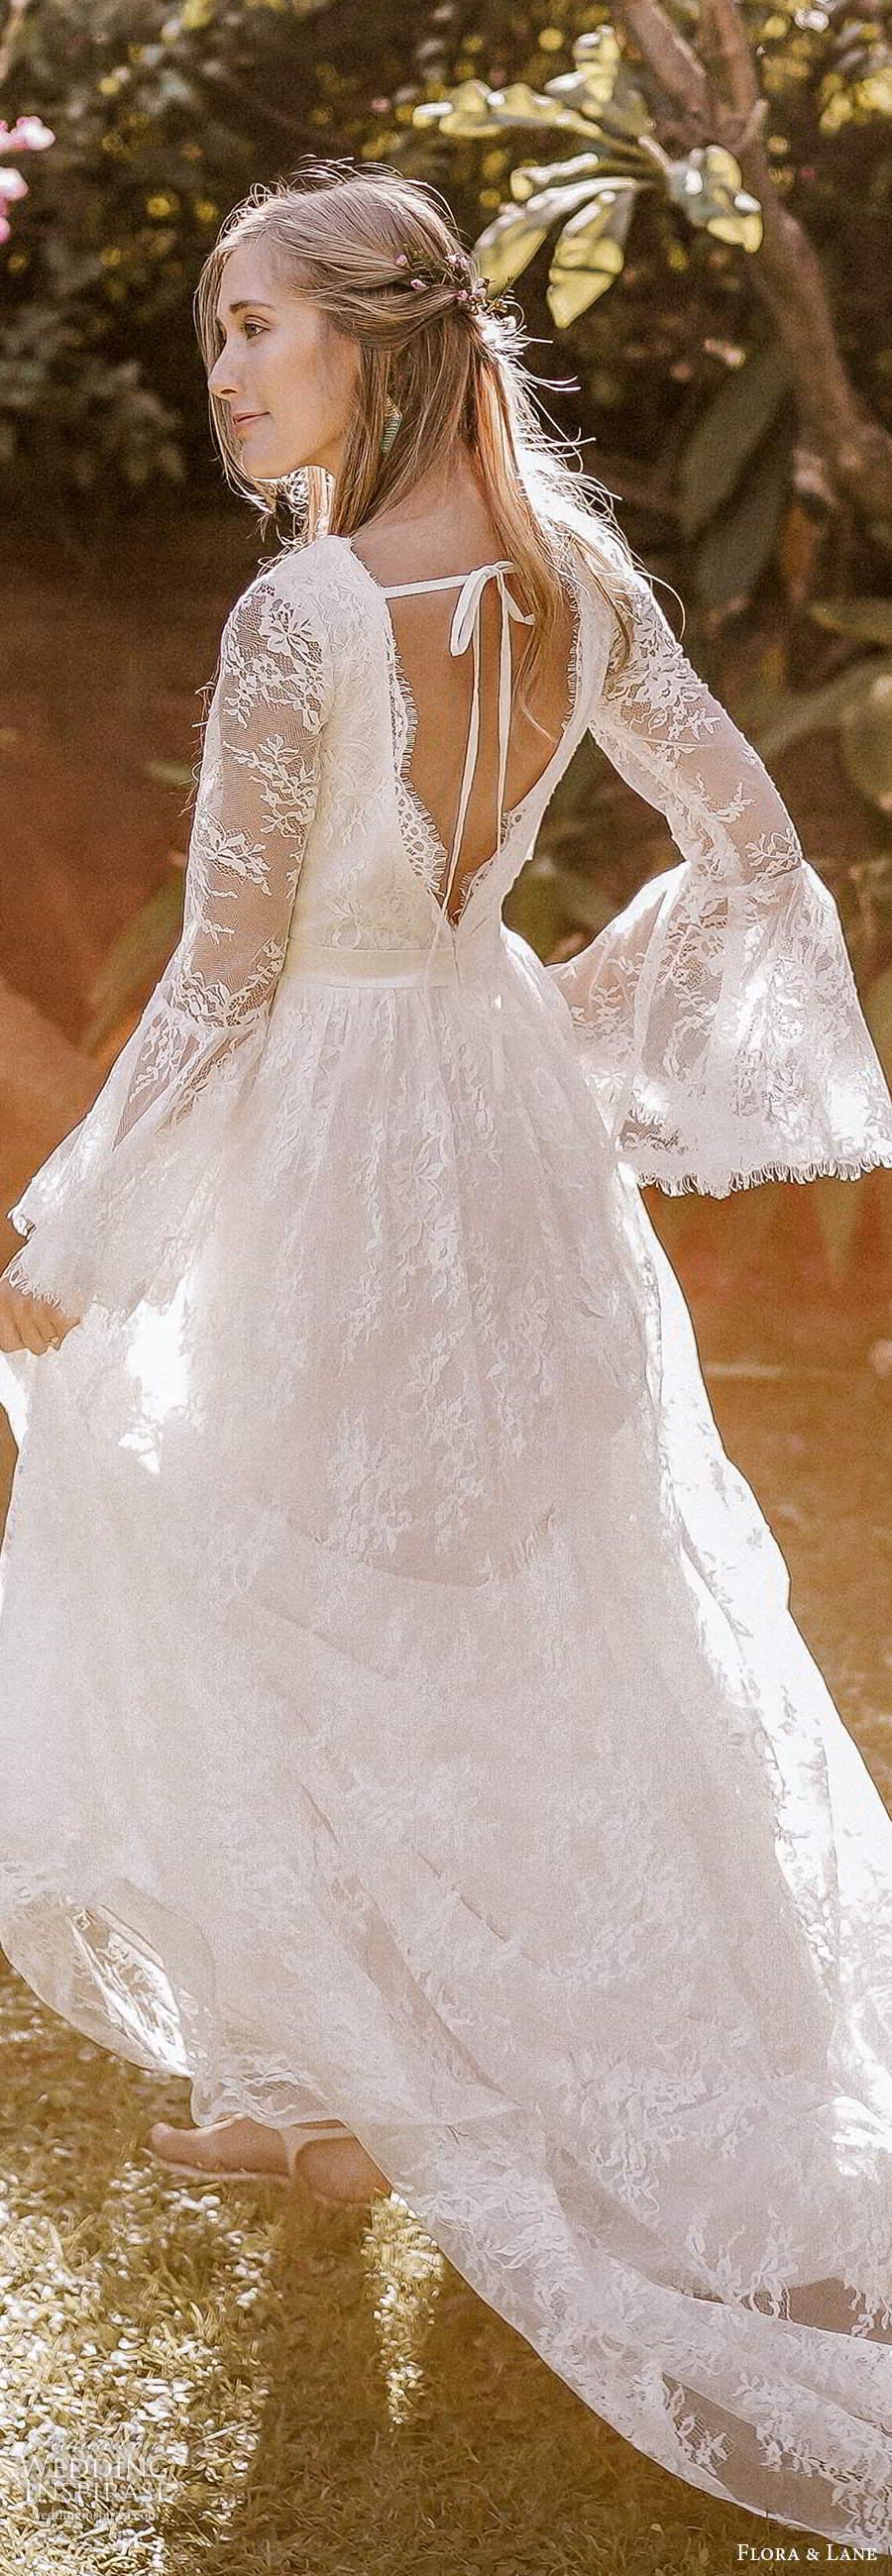 flora and lane 2019 bridal long flare sleeves v neckline fully embellished lace boho romantic a line wedding dress v back chapel train (3) lv